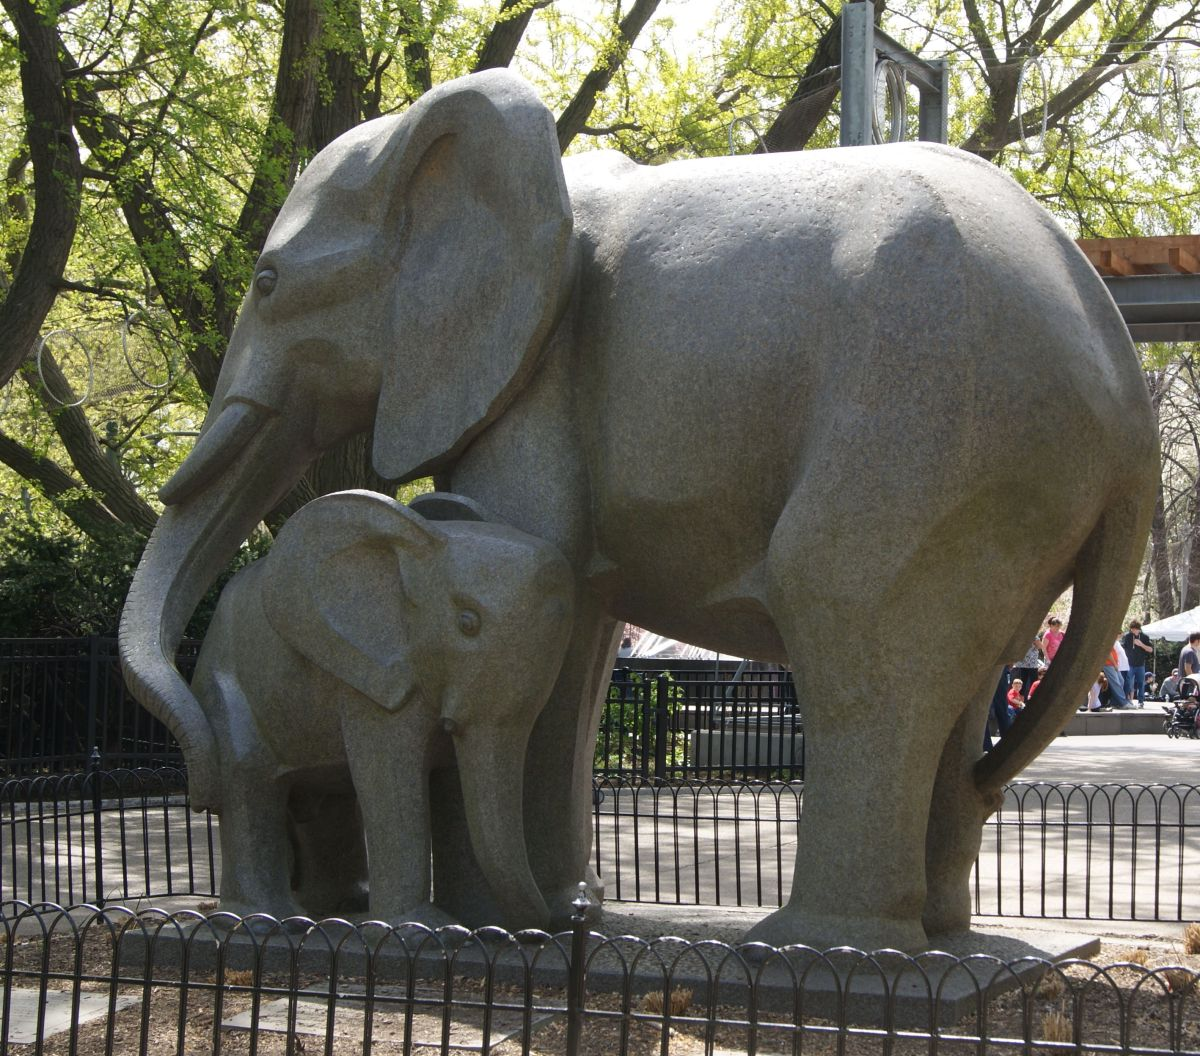 cancerinmythirties.wordpress.com breast cancer thirties 30s 30's kiss elephant mom baby